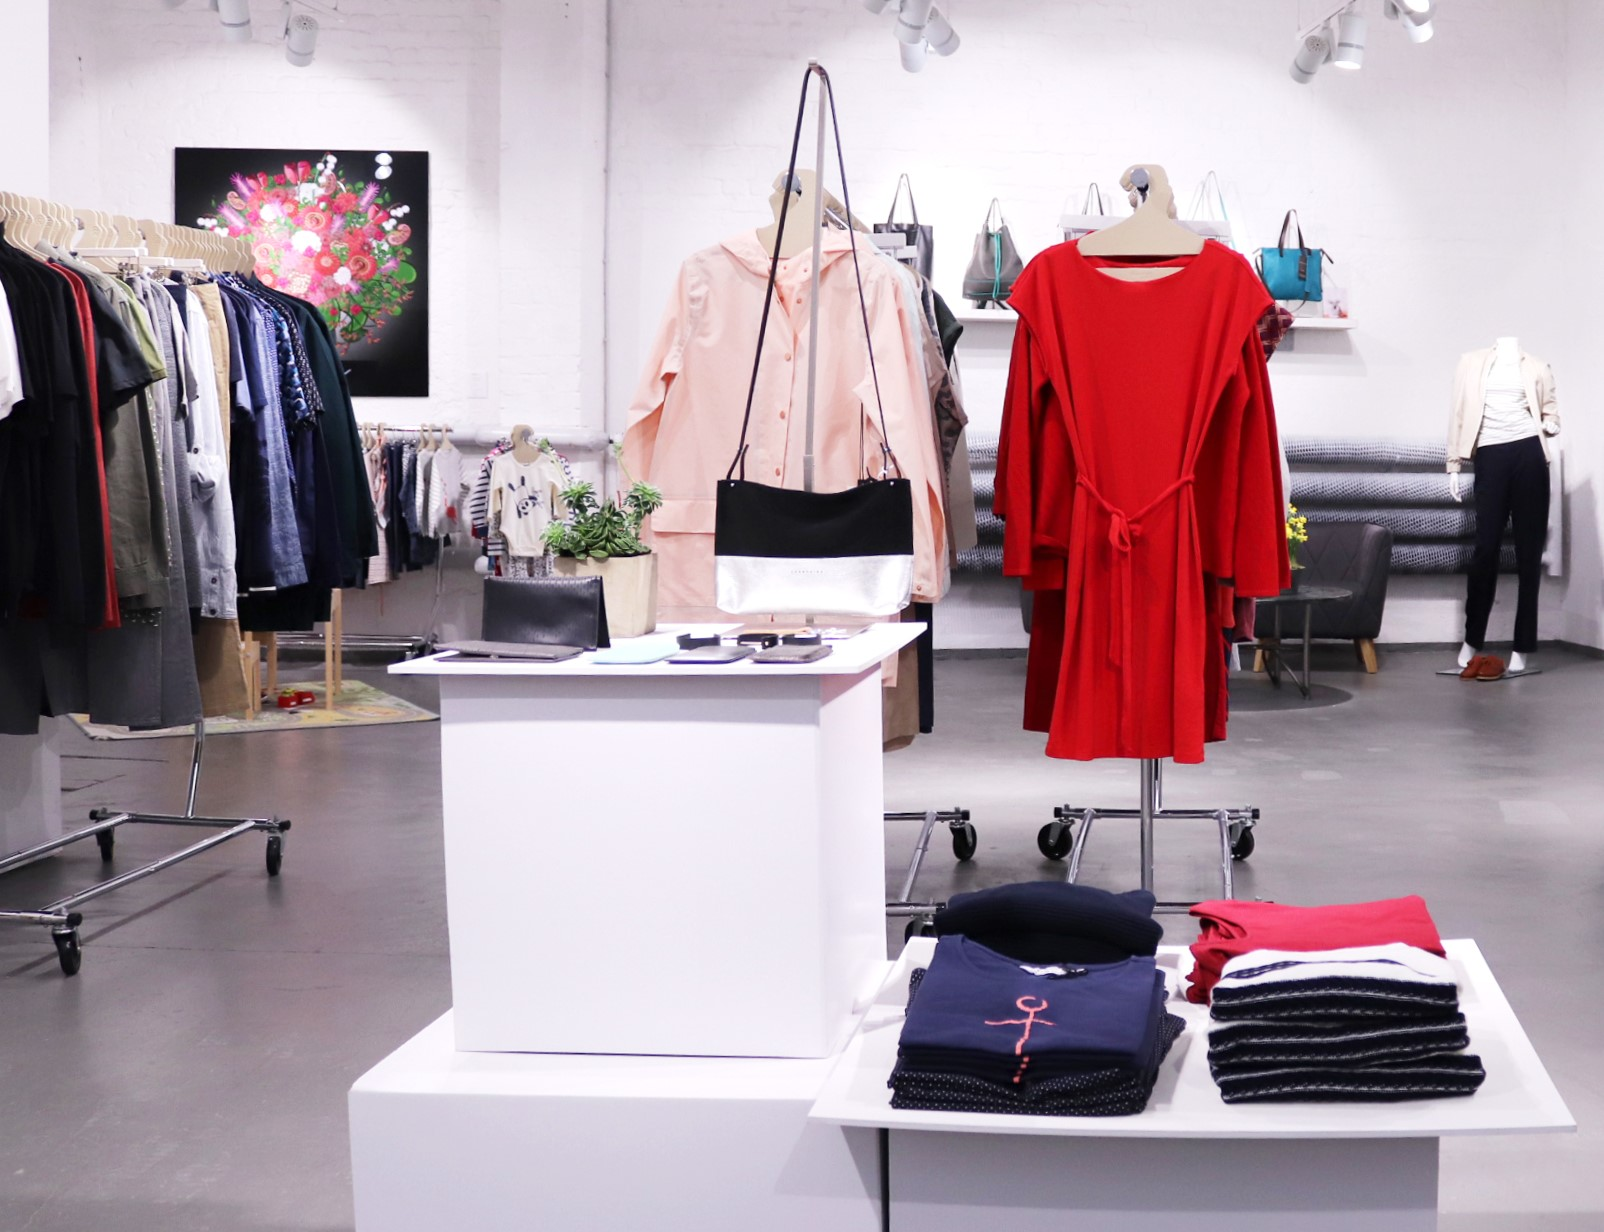 https://www.buygoodstuff.de/wp-content/uploads/2019/01/Bild-1b-roberta_organic_fashion_eingang.jpg